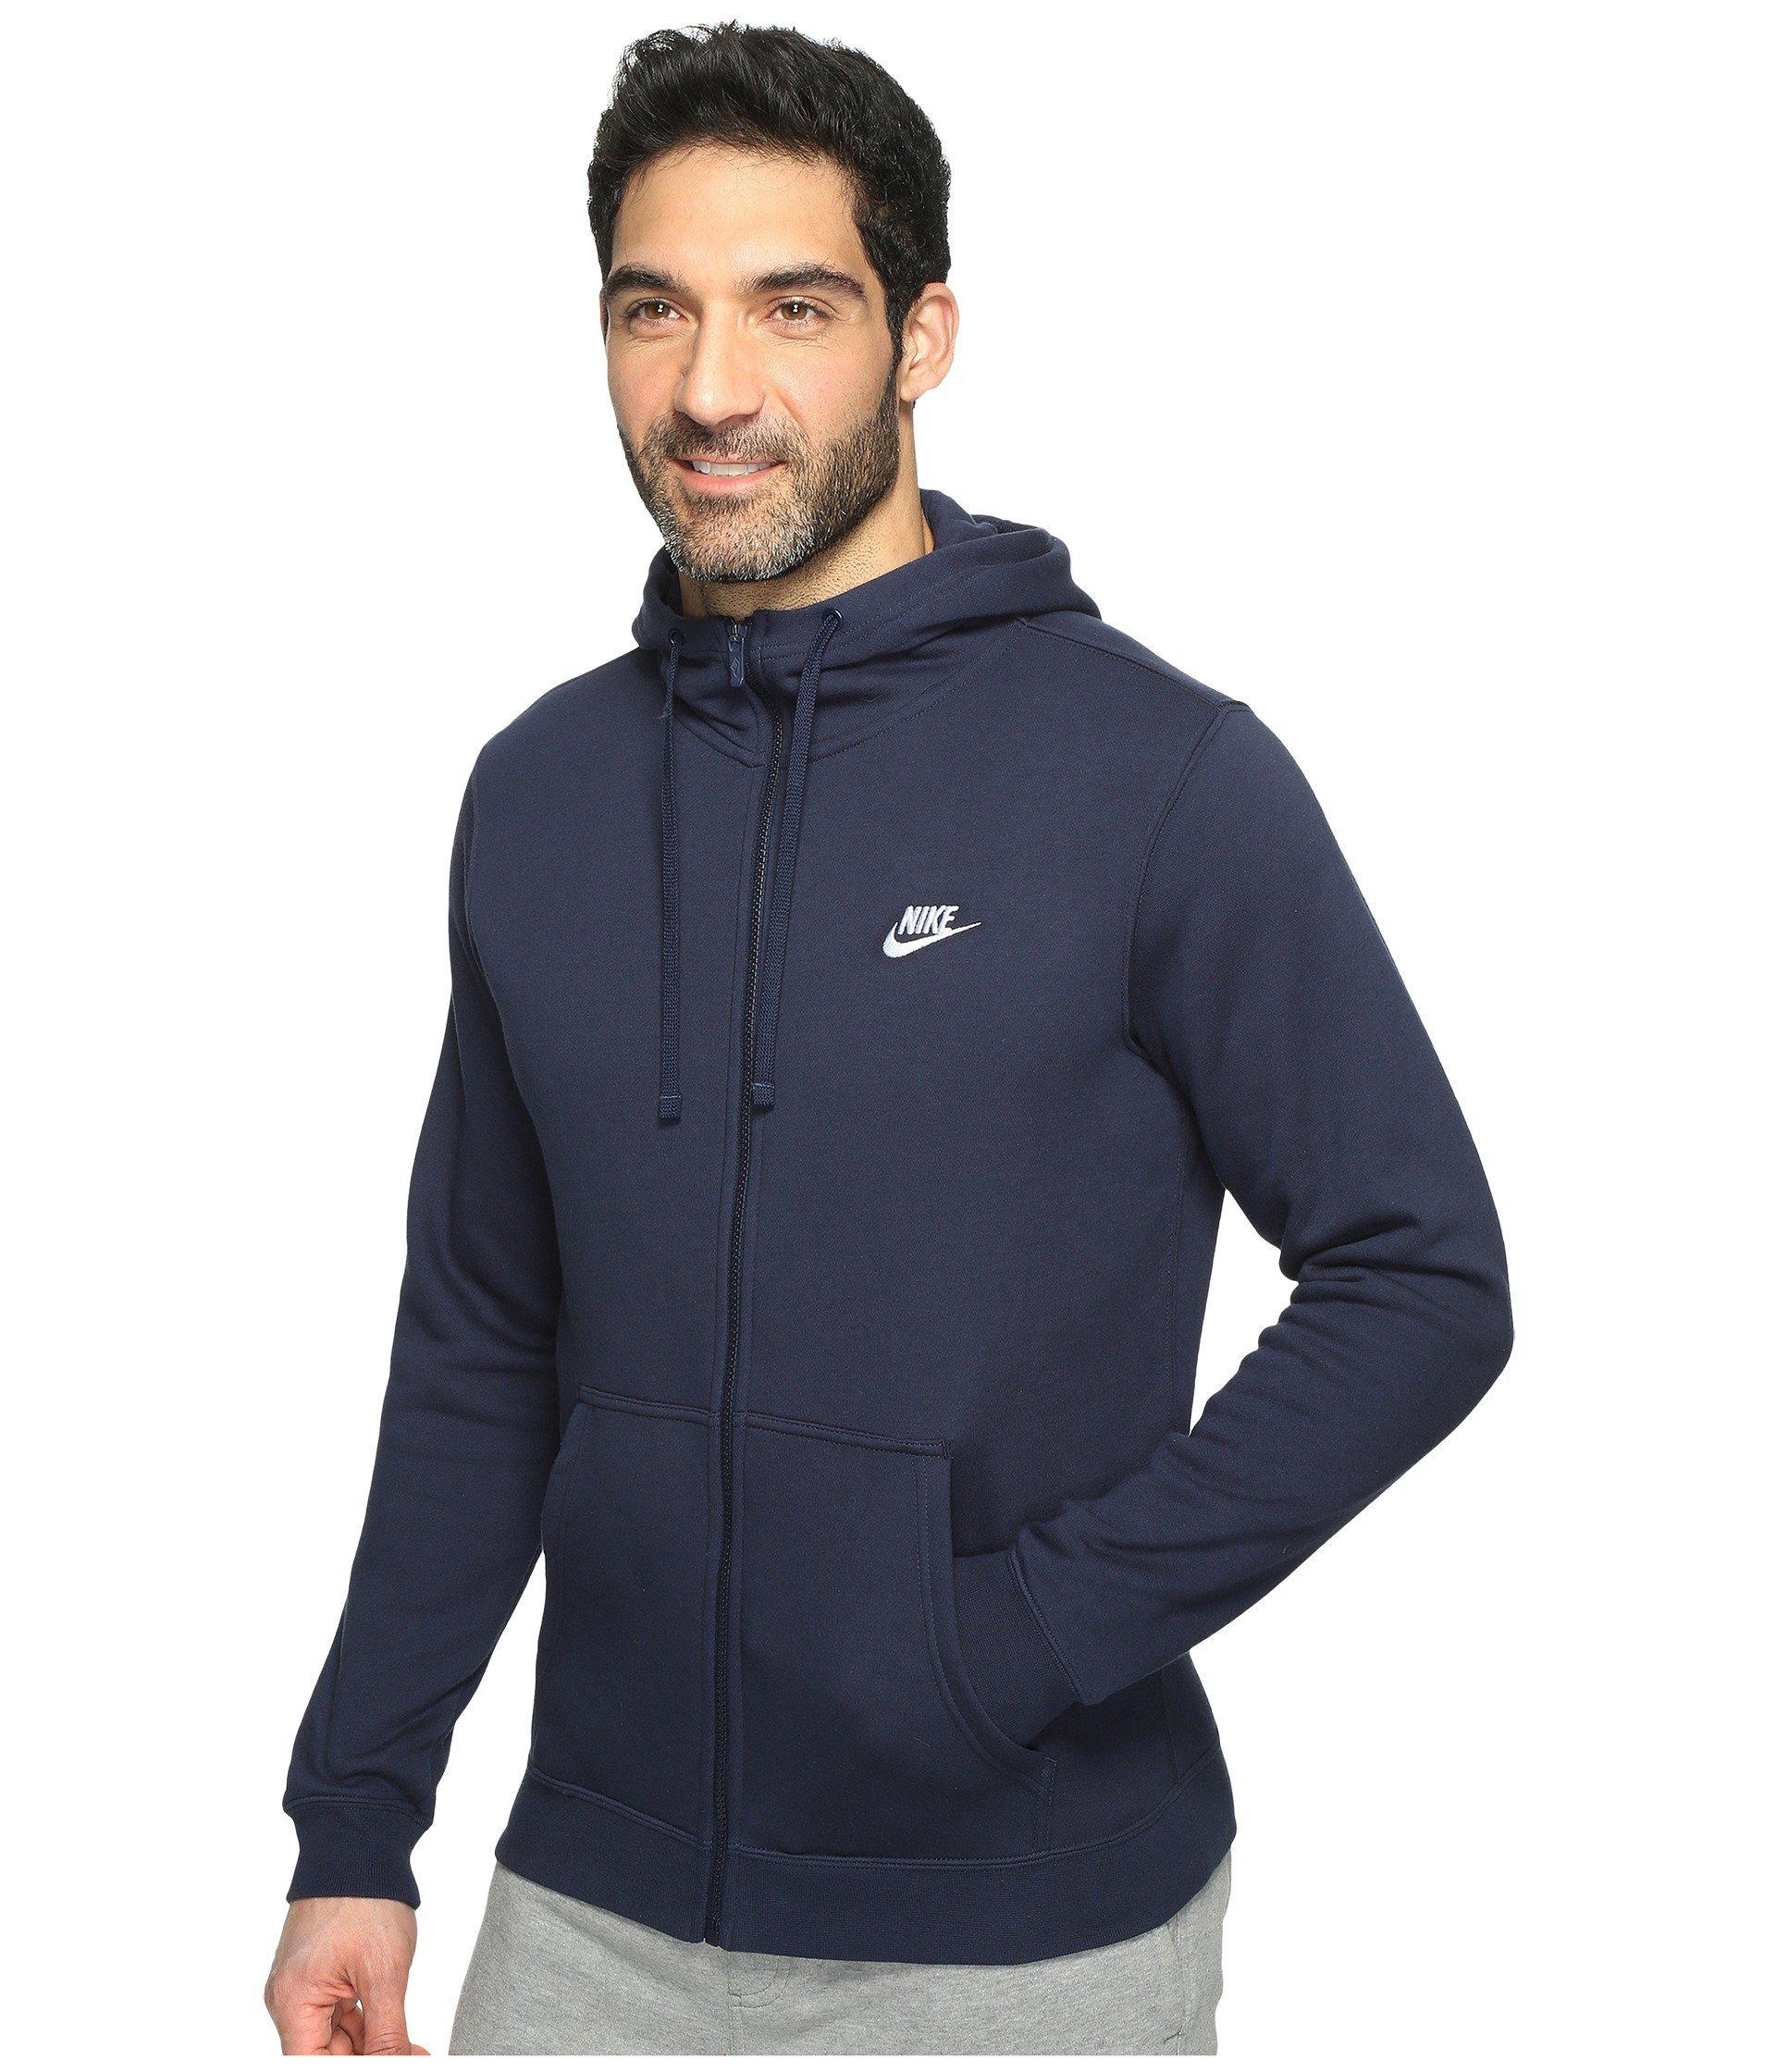 b847929fa983 Lyst - Nike Club Fleece Full-zip Hoodie (charcoal Heather charcoal  Heather white) Men s Fleece in Blue for Men